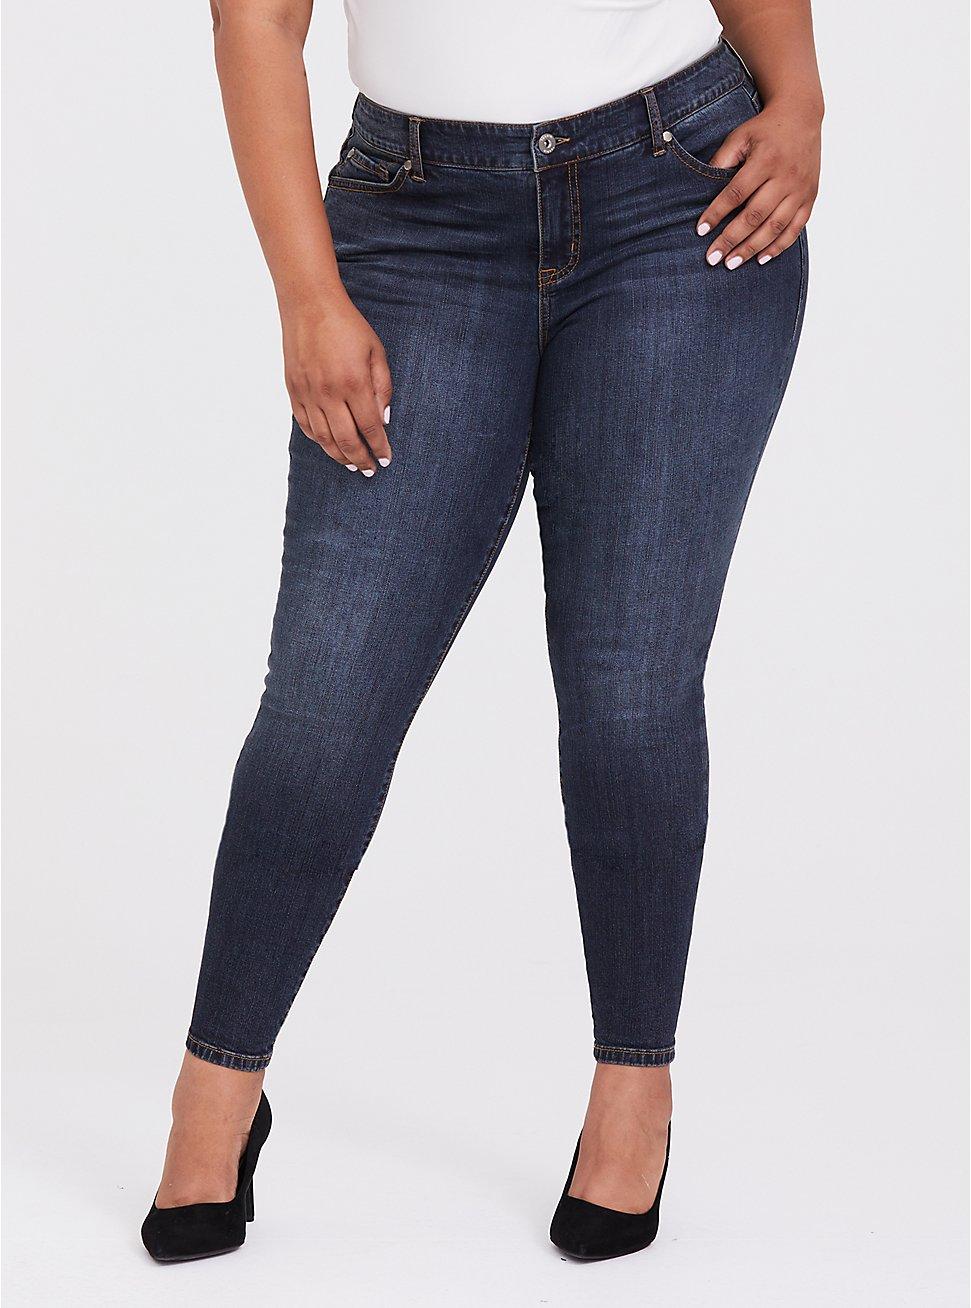 Mid Rise Skinny Jean - Vintage Stretch Dark Wash, MAUI, hi-res